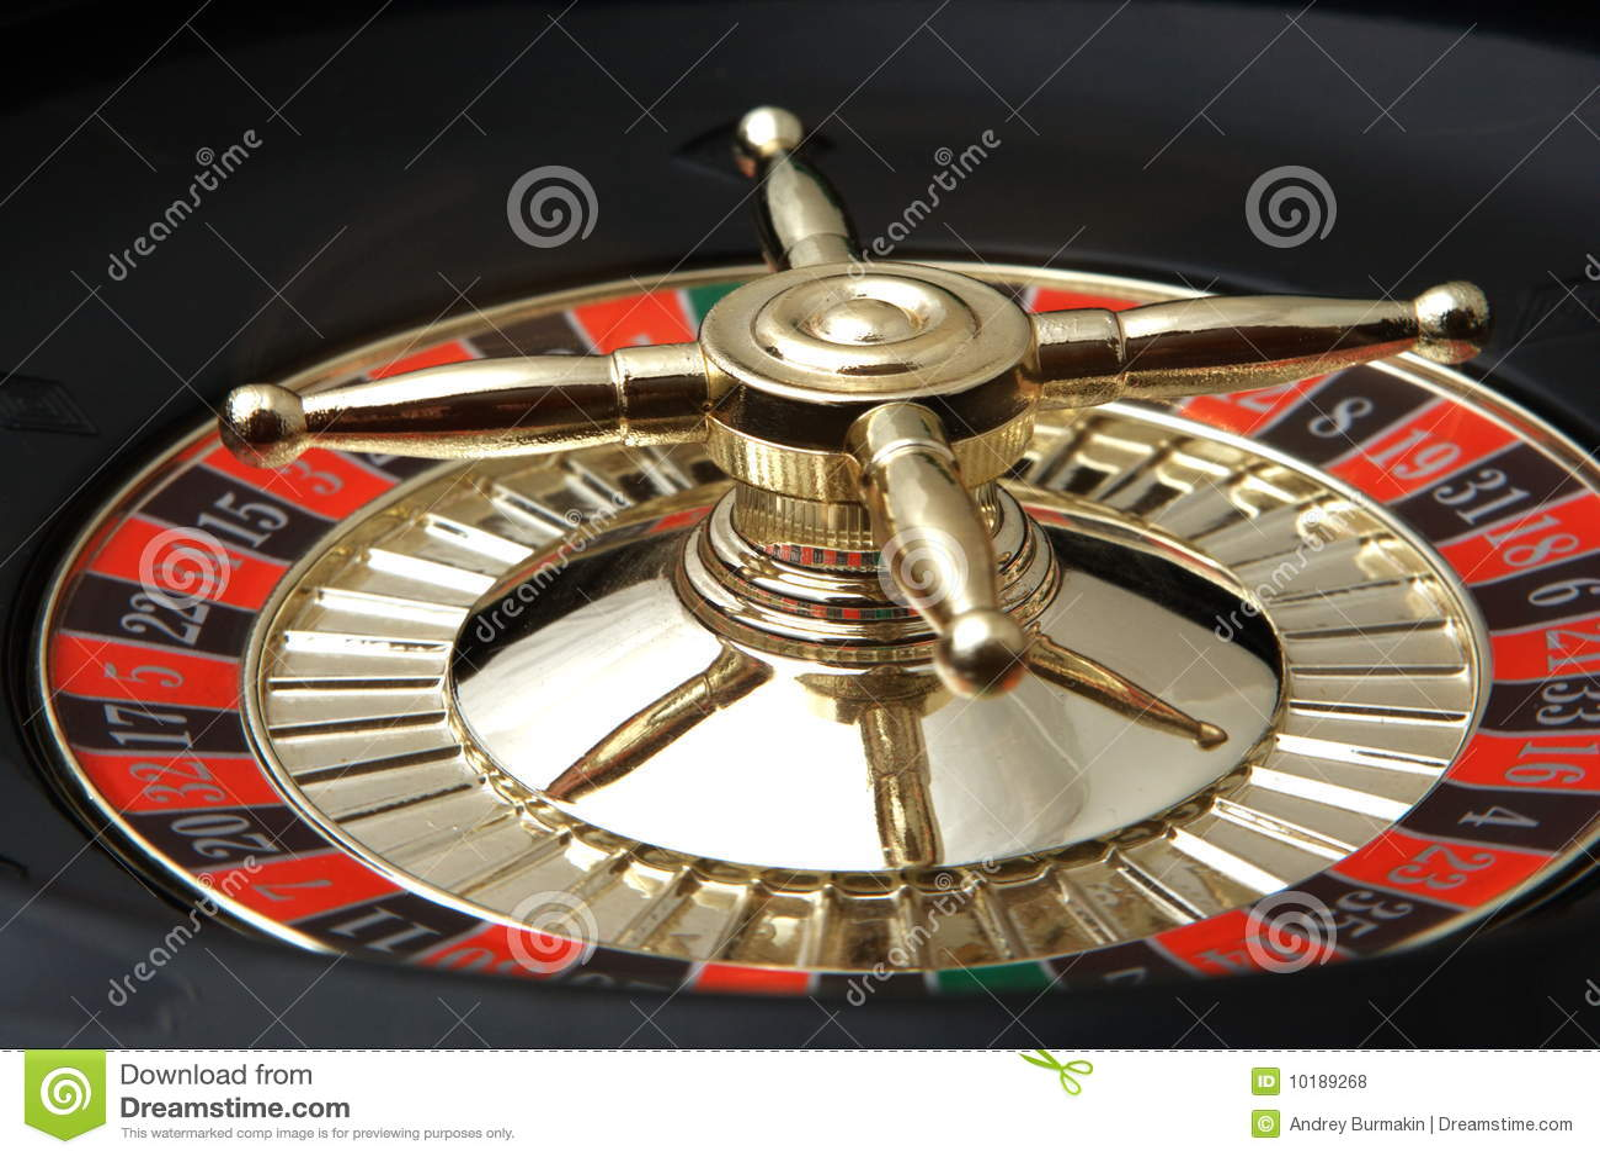 Roulettes Casino Free